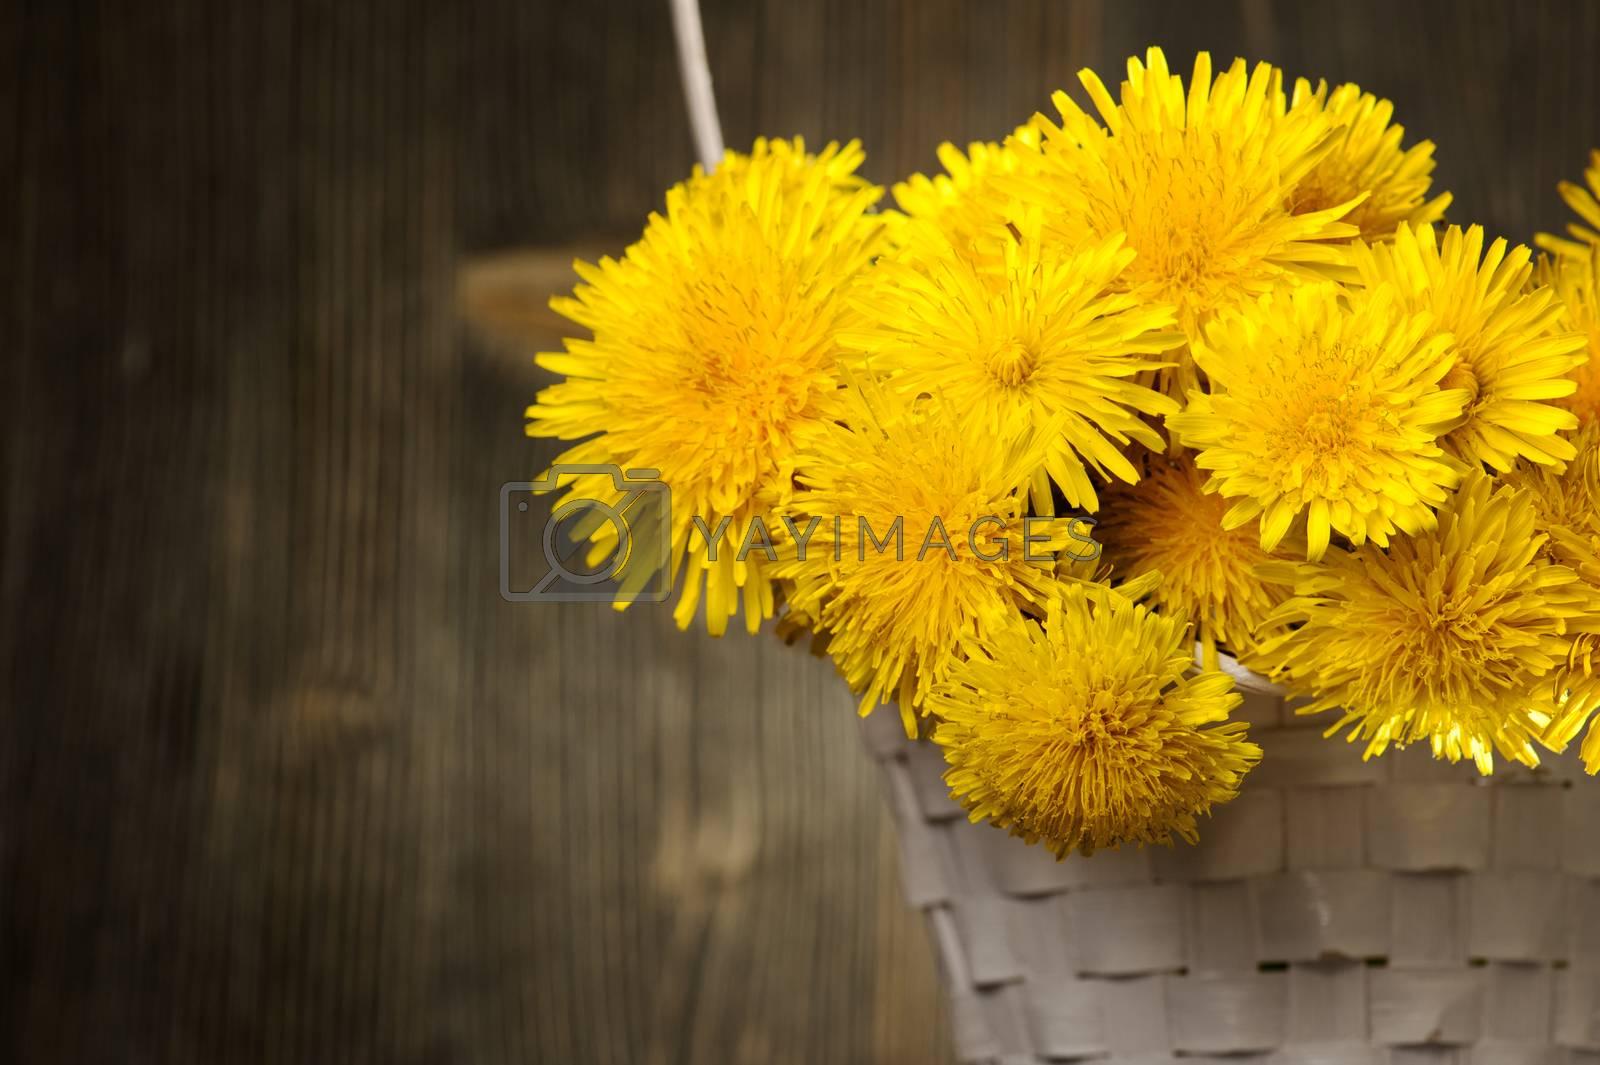 Dandelions in a basket on dark wooden background